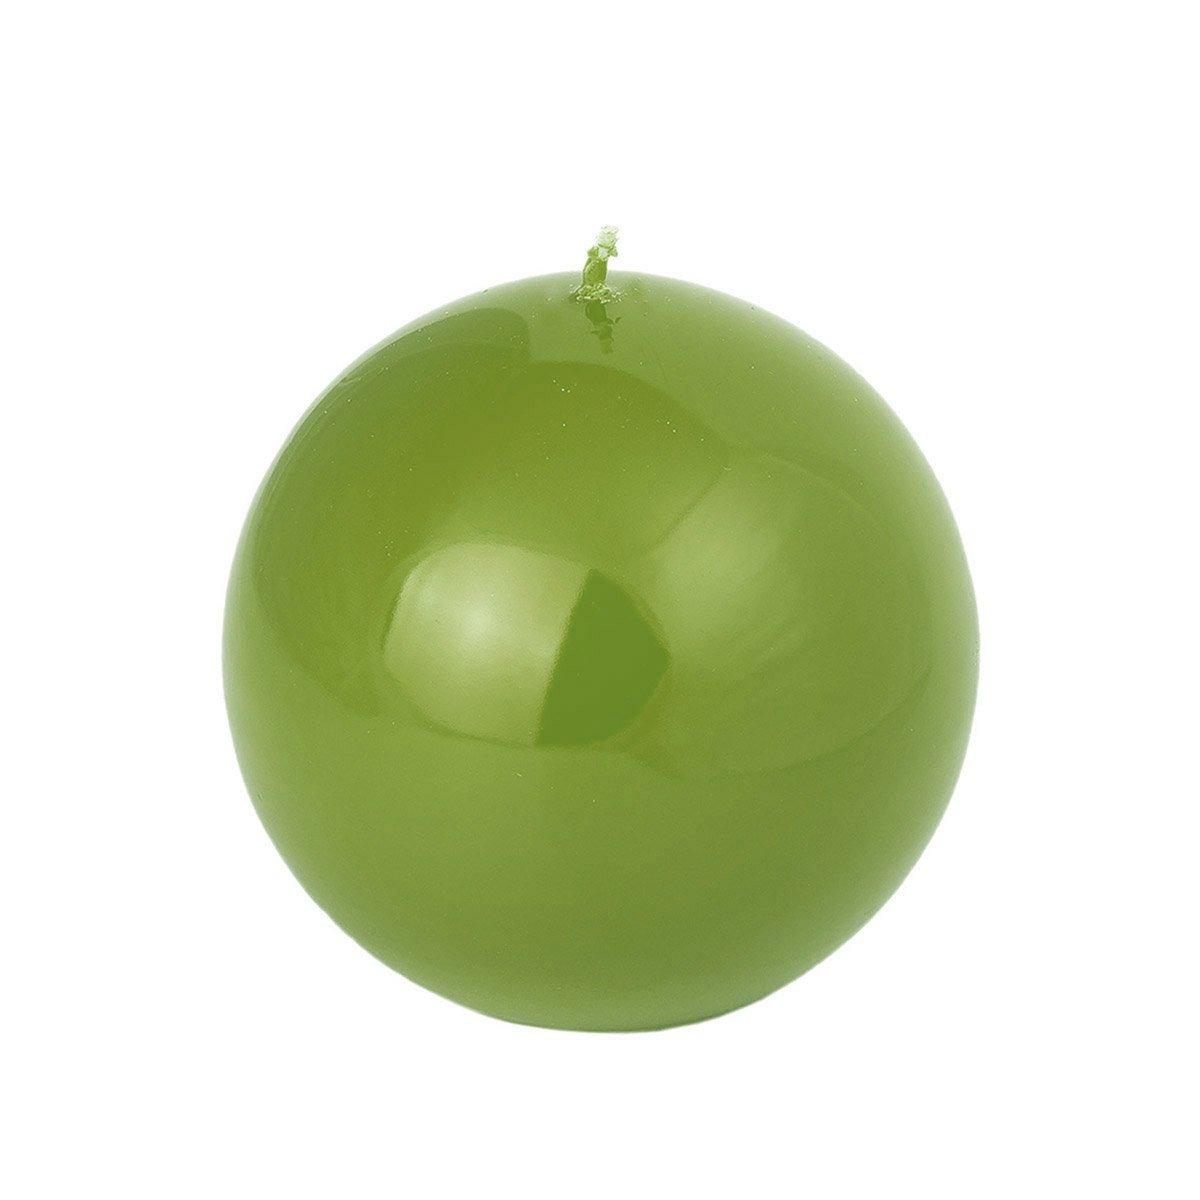 Magnifique brillante olivgrü ne Boule Bougies 4 tailles, vert olive, Komplettset alle 4 Grö ß en Komplettset alle 4 Größen Adpal Kerzenmanufaktur